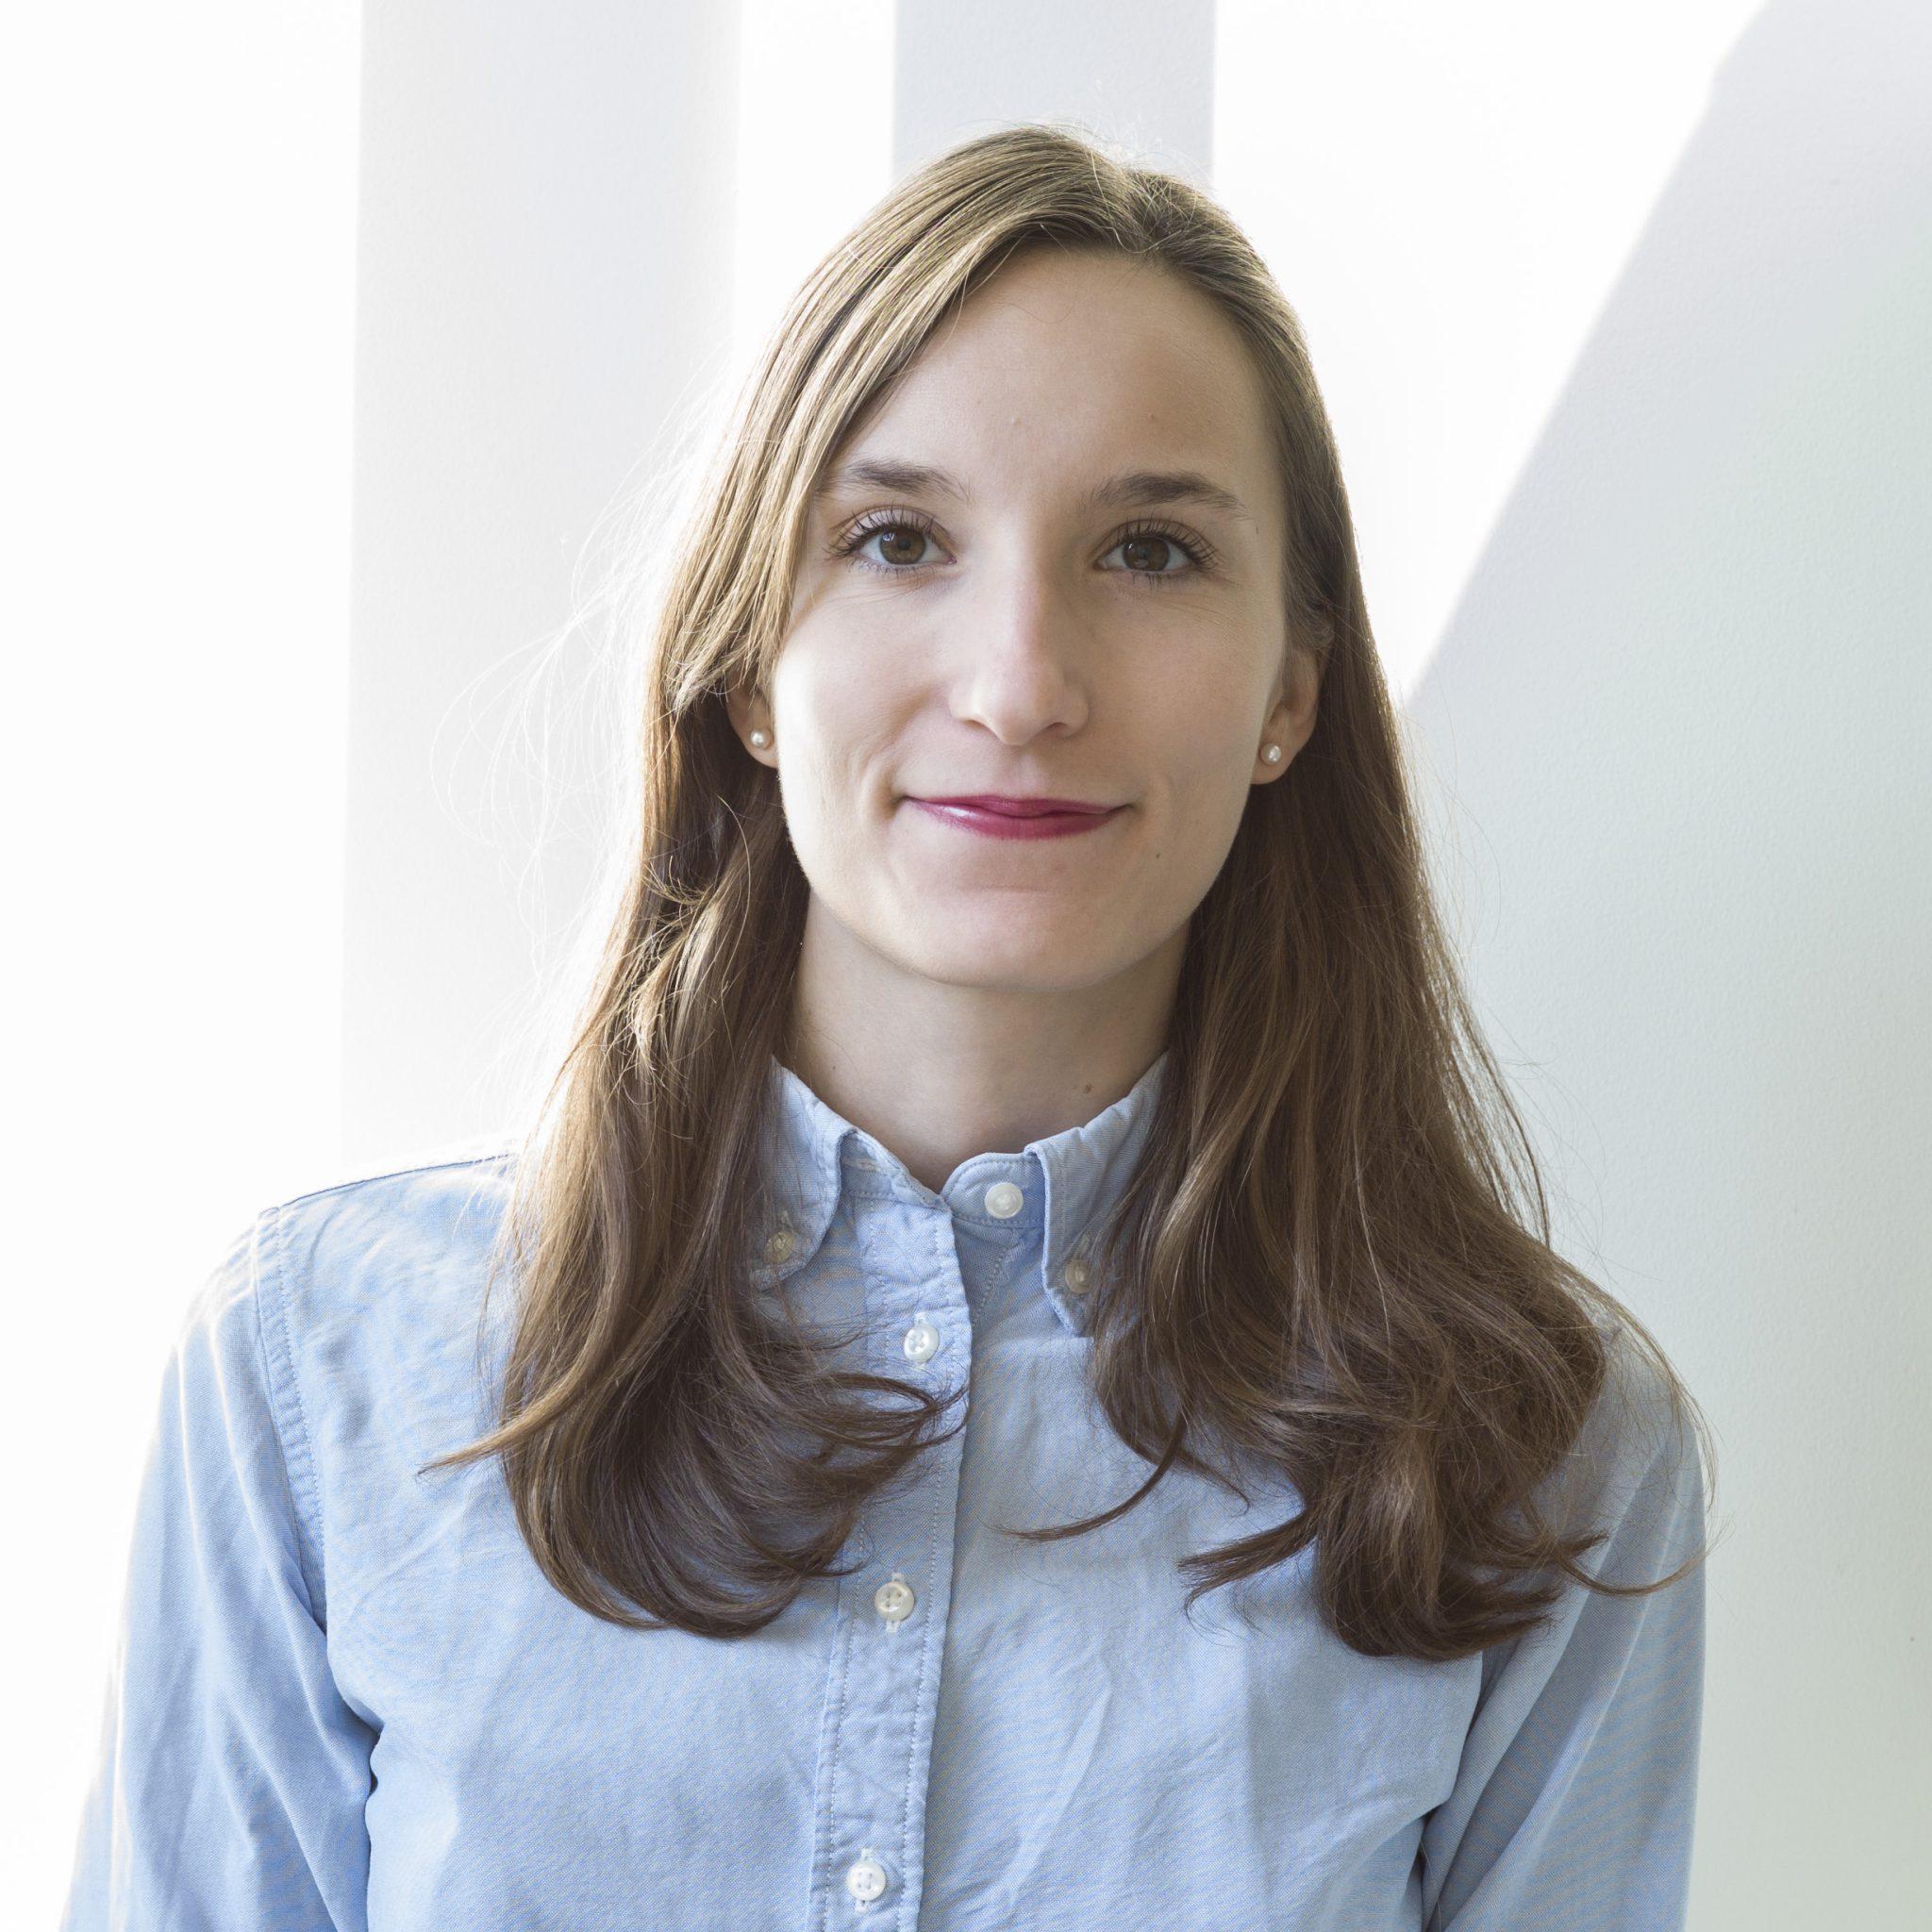 Angelica Ruckstuhl